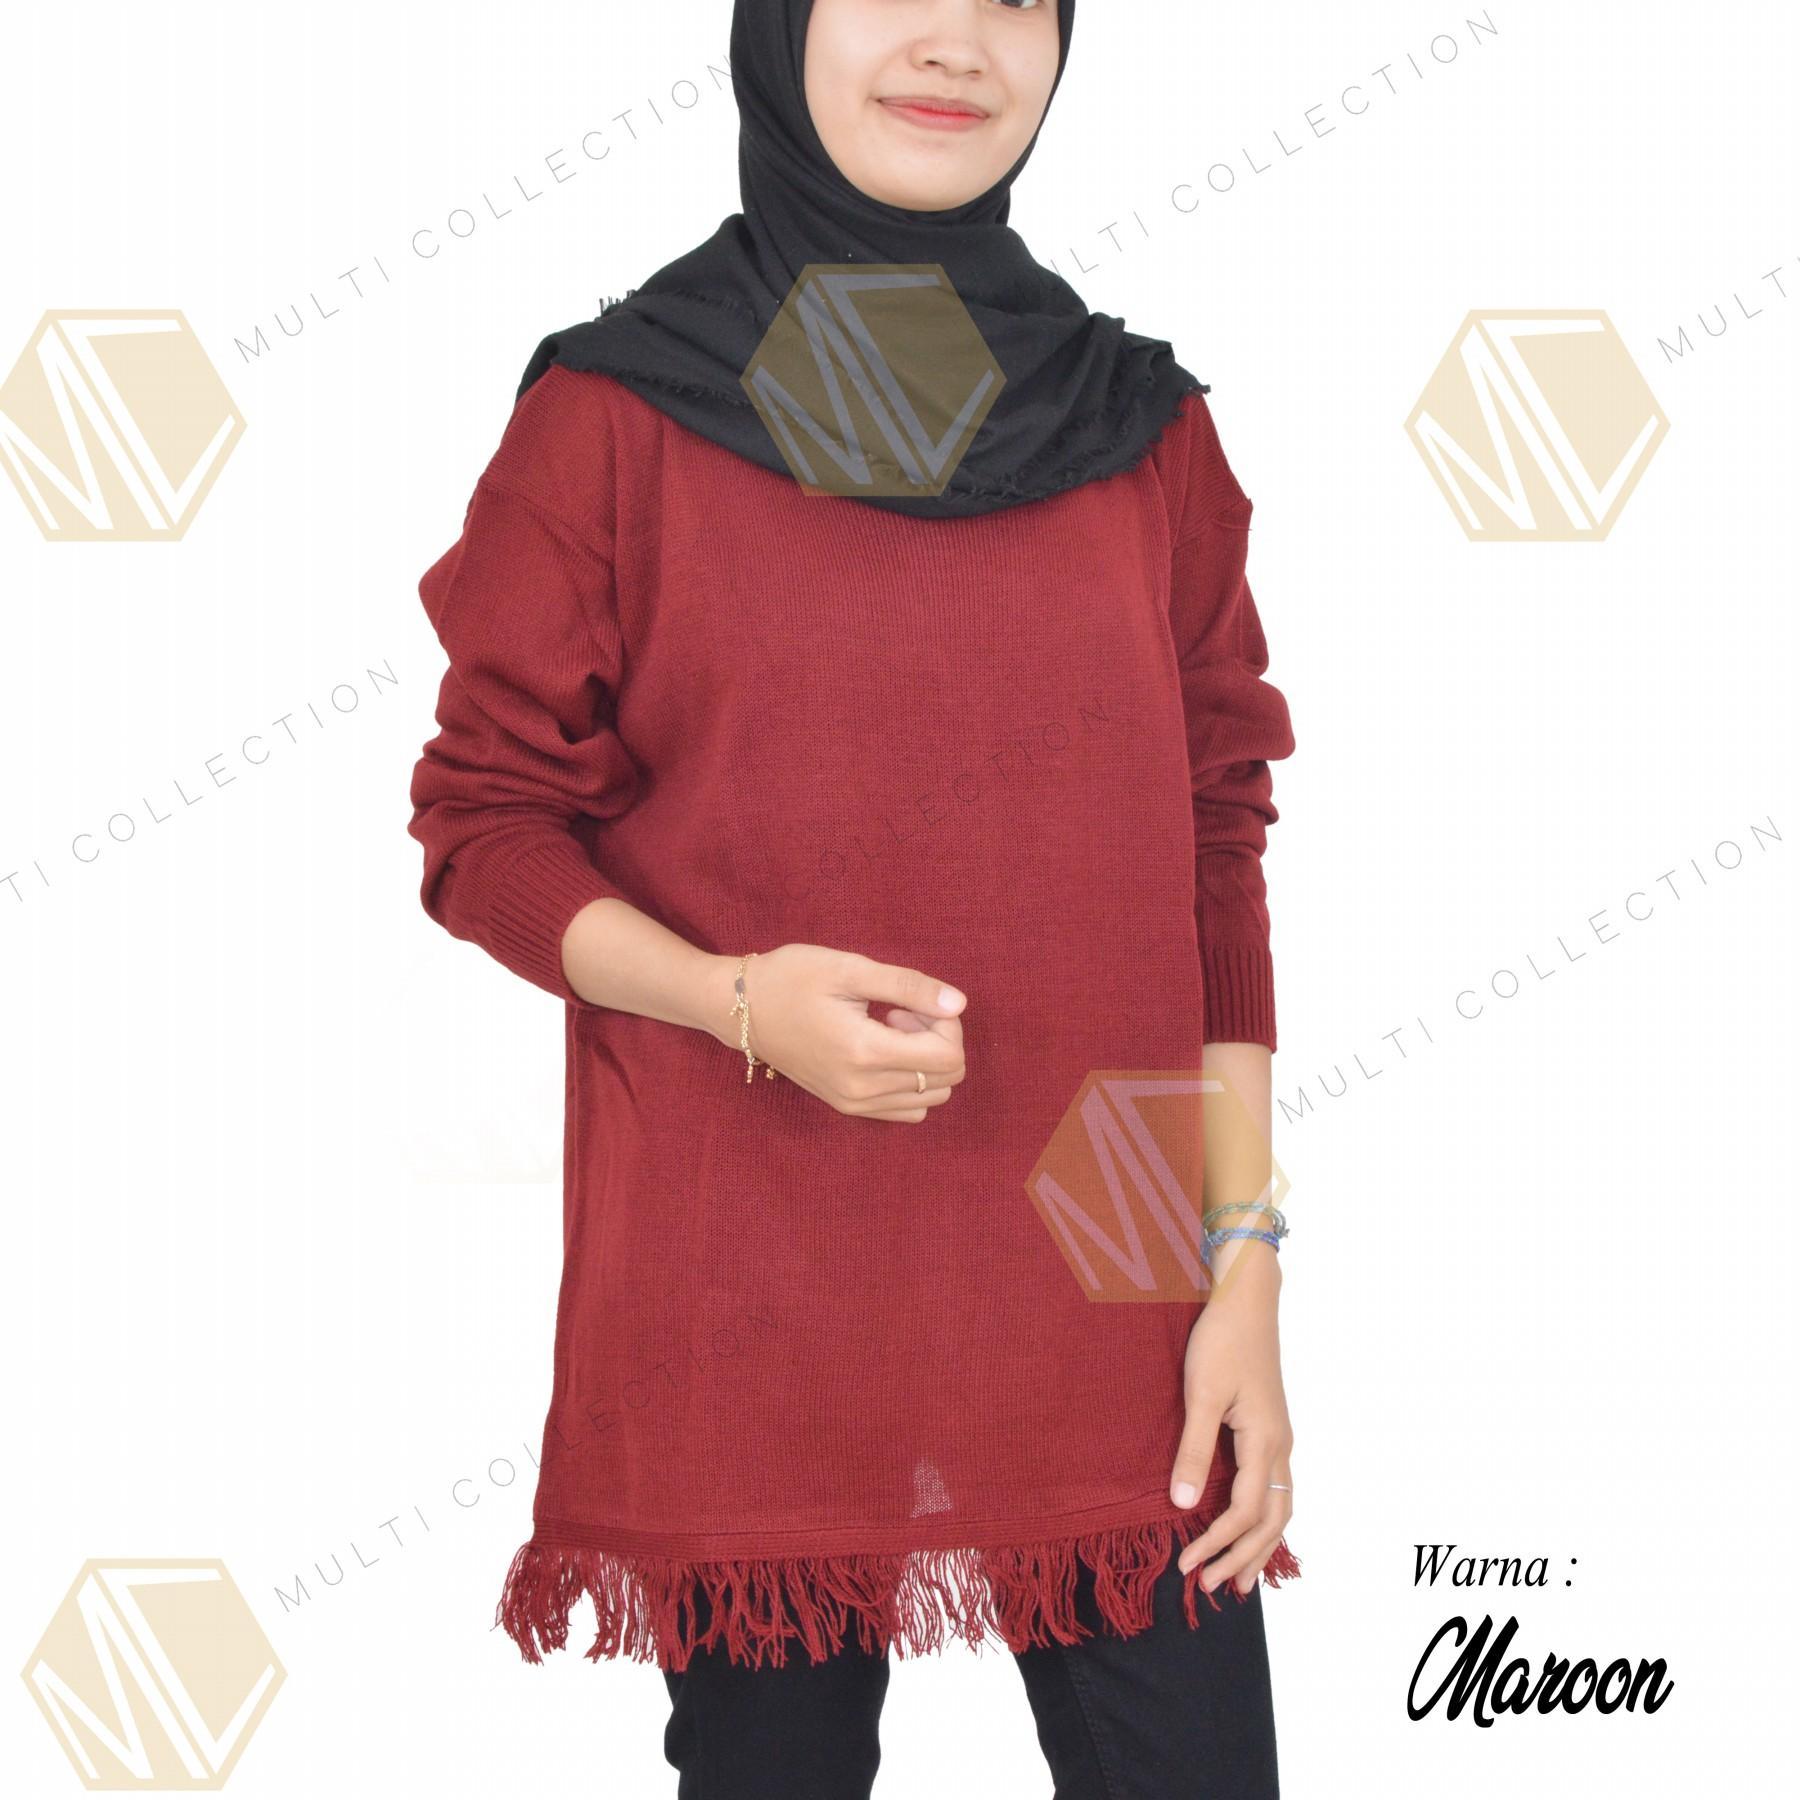 Buy Sell Cheapest Glow Rajut Raida Best Quality Product Deals Knit Atasan Baju Wanita  Pakaian Rawis Slim Sweater Besar Korea Big Size